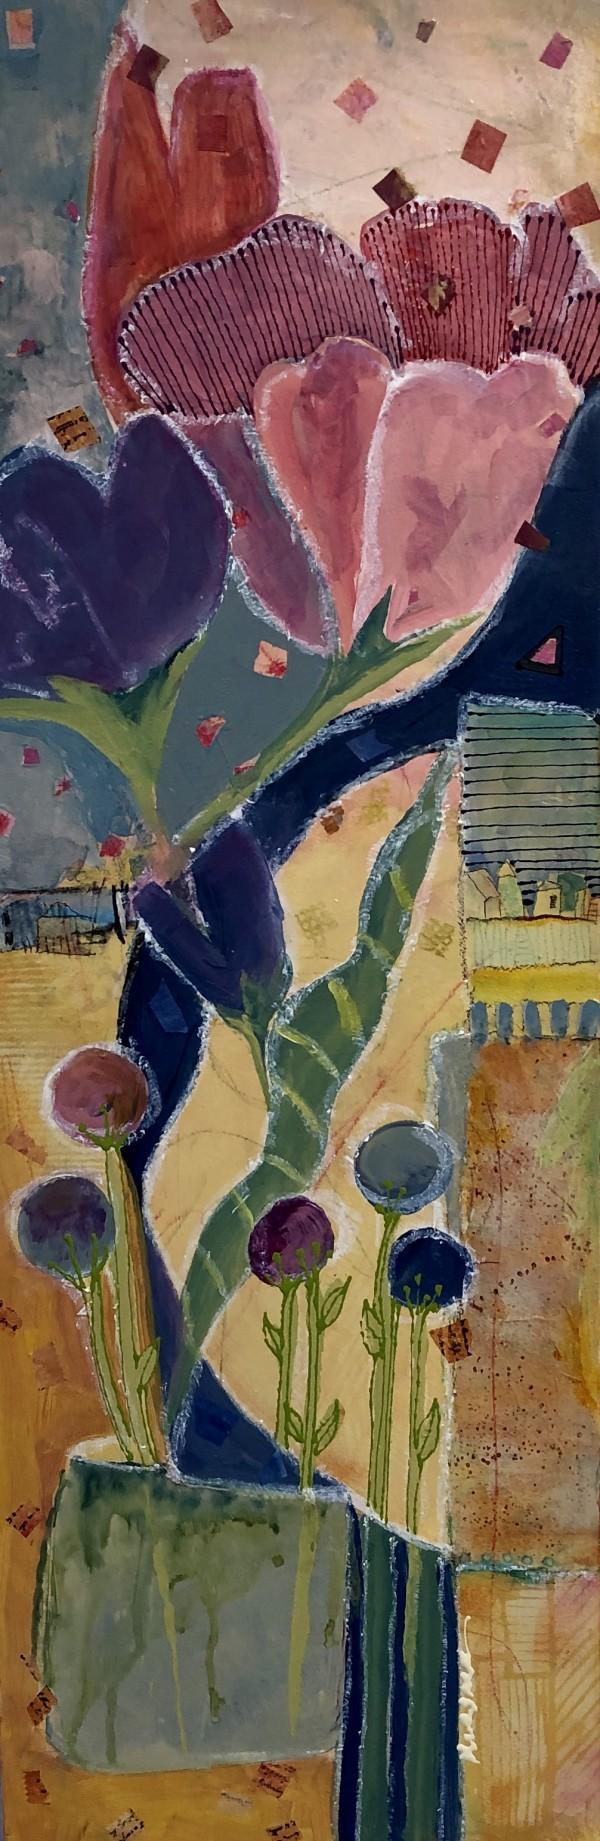 PEONY & ORANGE TULIP by Jill Krasner